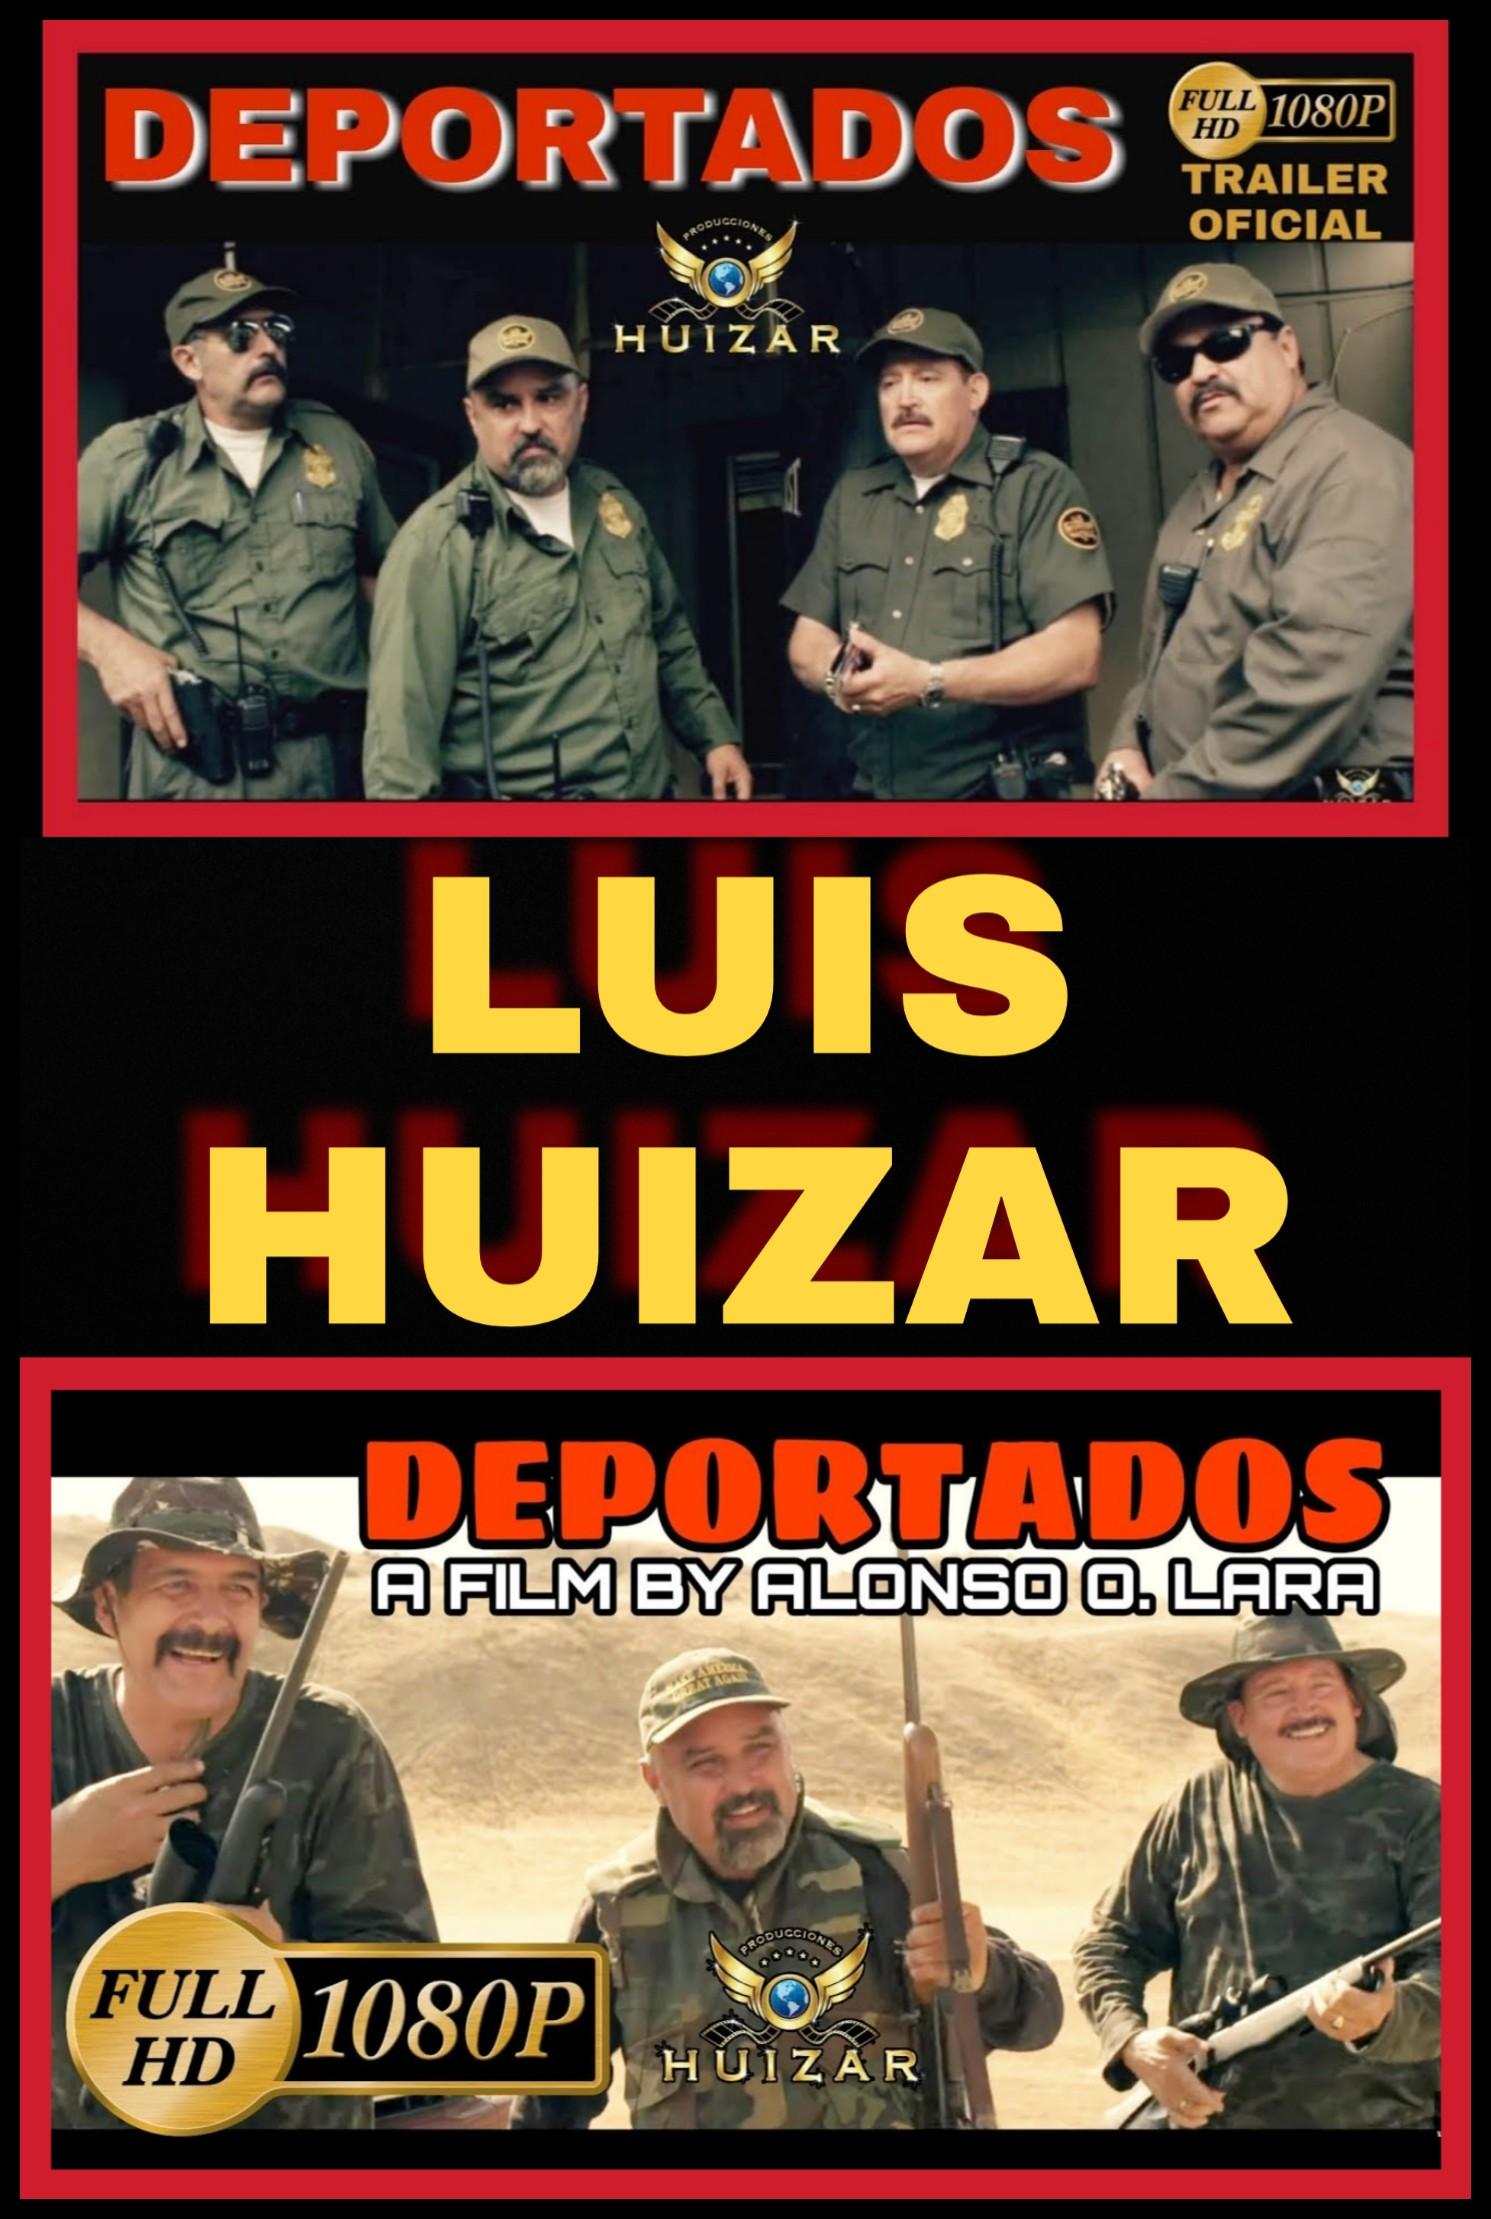 Luis Huizar, Vianey Huizar, Jesus Heredia, Jesus Esparza, Jose Ramirez Raya, Chitto Buenrostro, Maria Patino, and Coty Caballero in Deportados (2019)